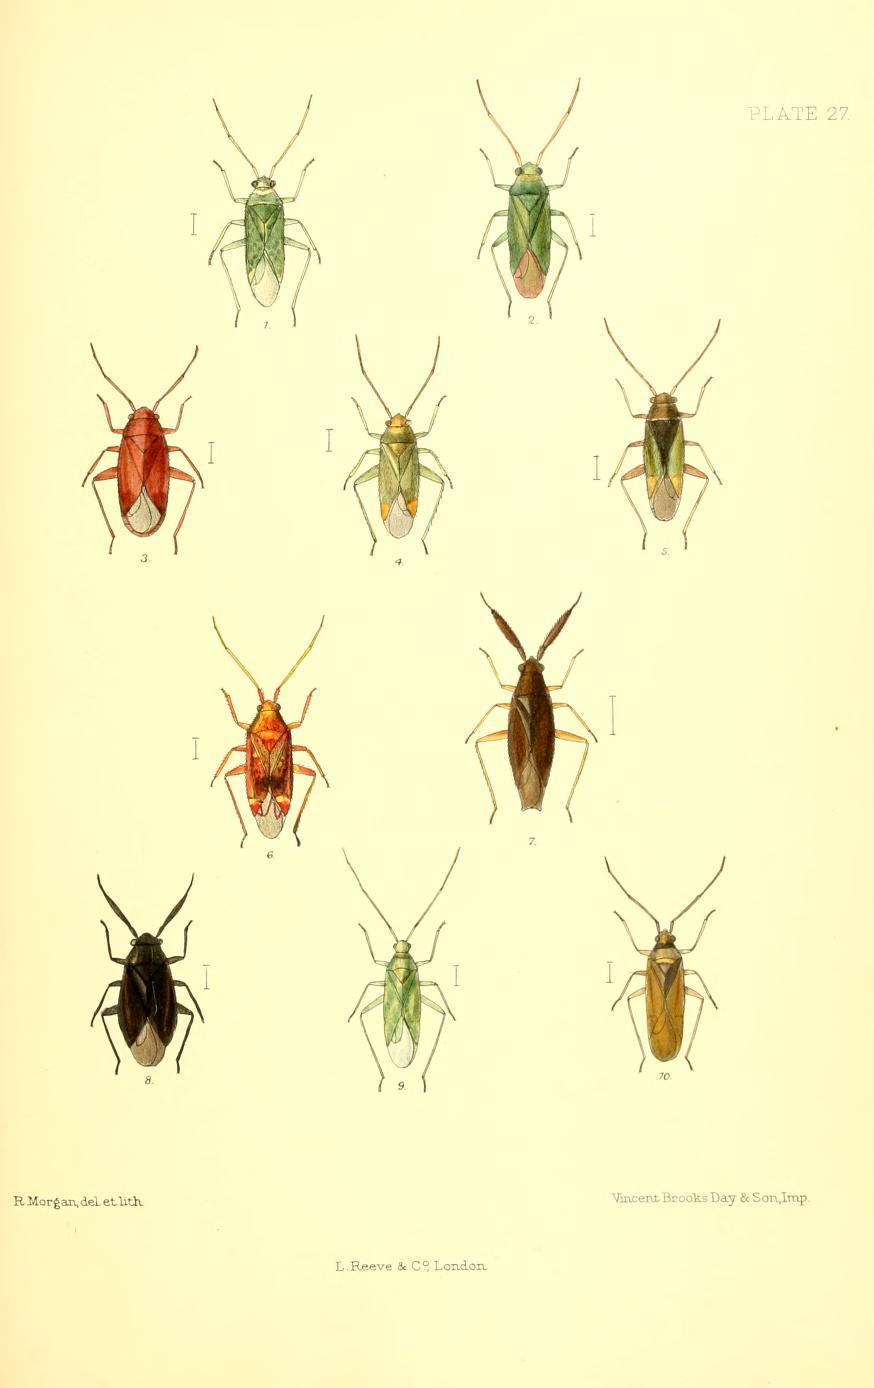 Image of Jumping tree bug